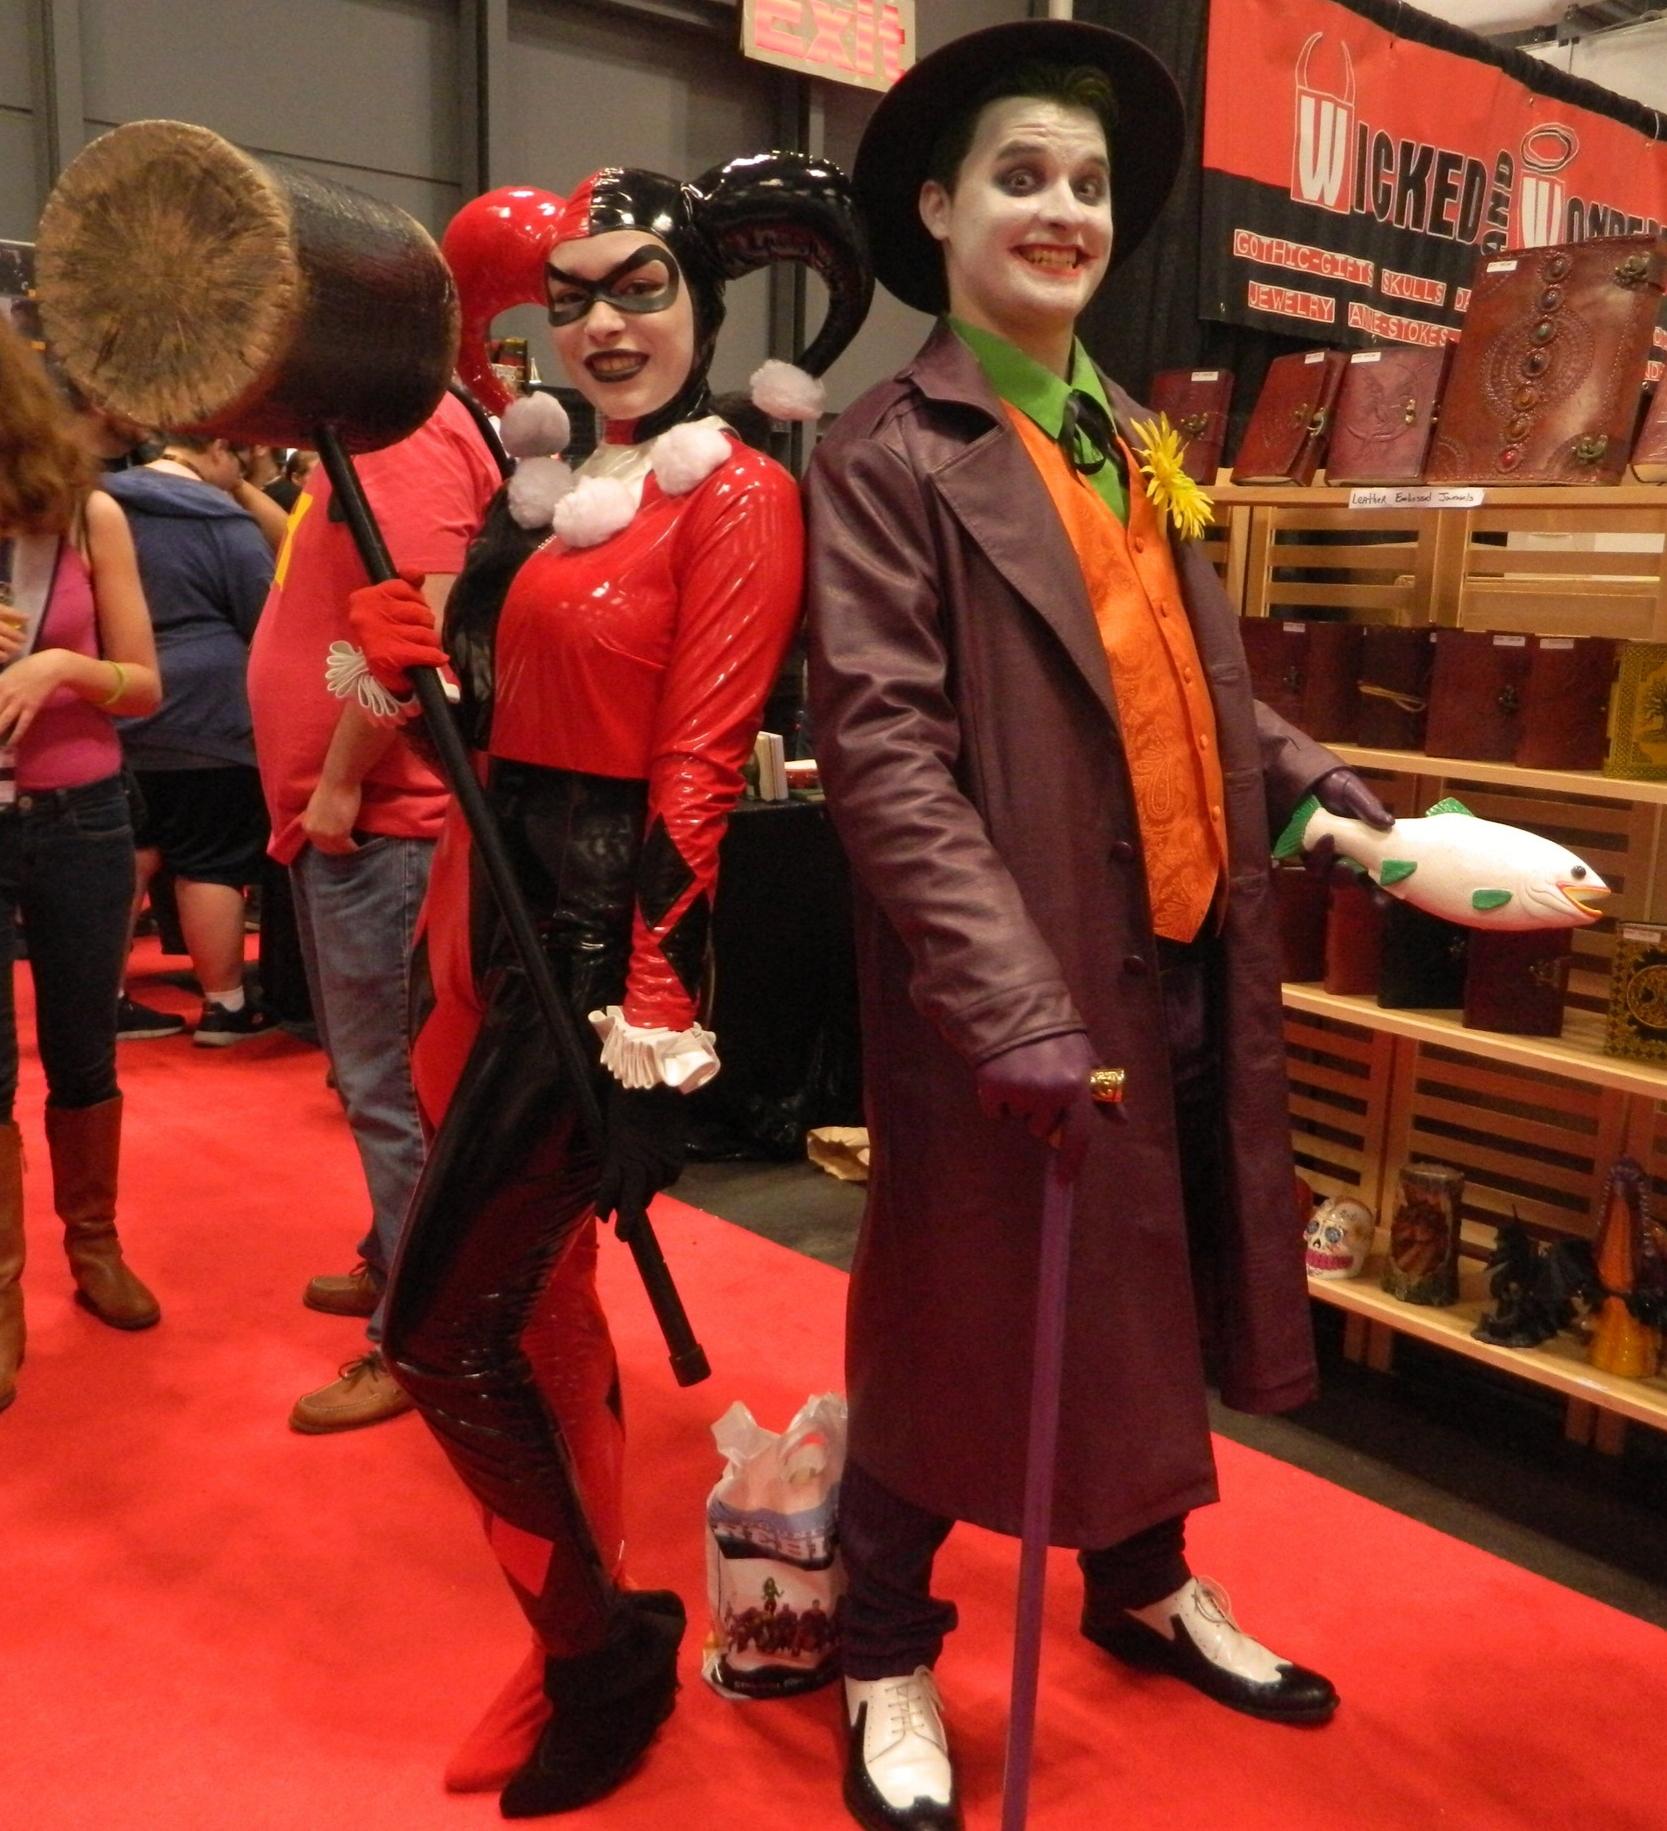 Cosplay Joker and Harley Quinn